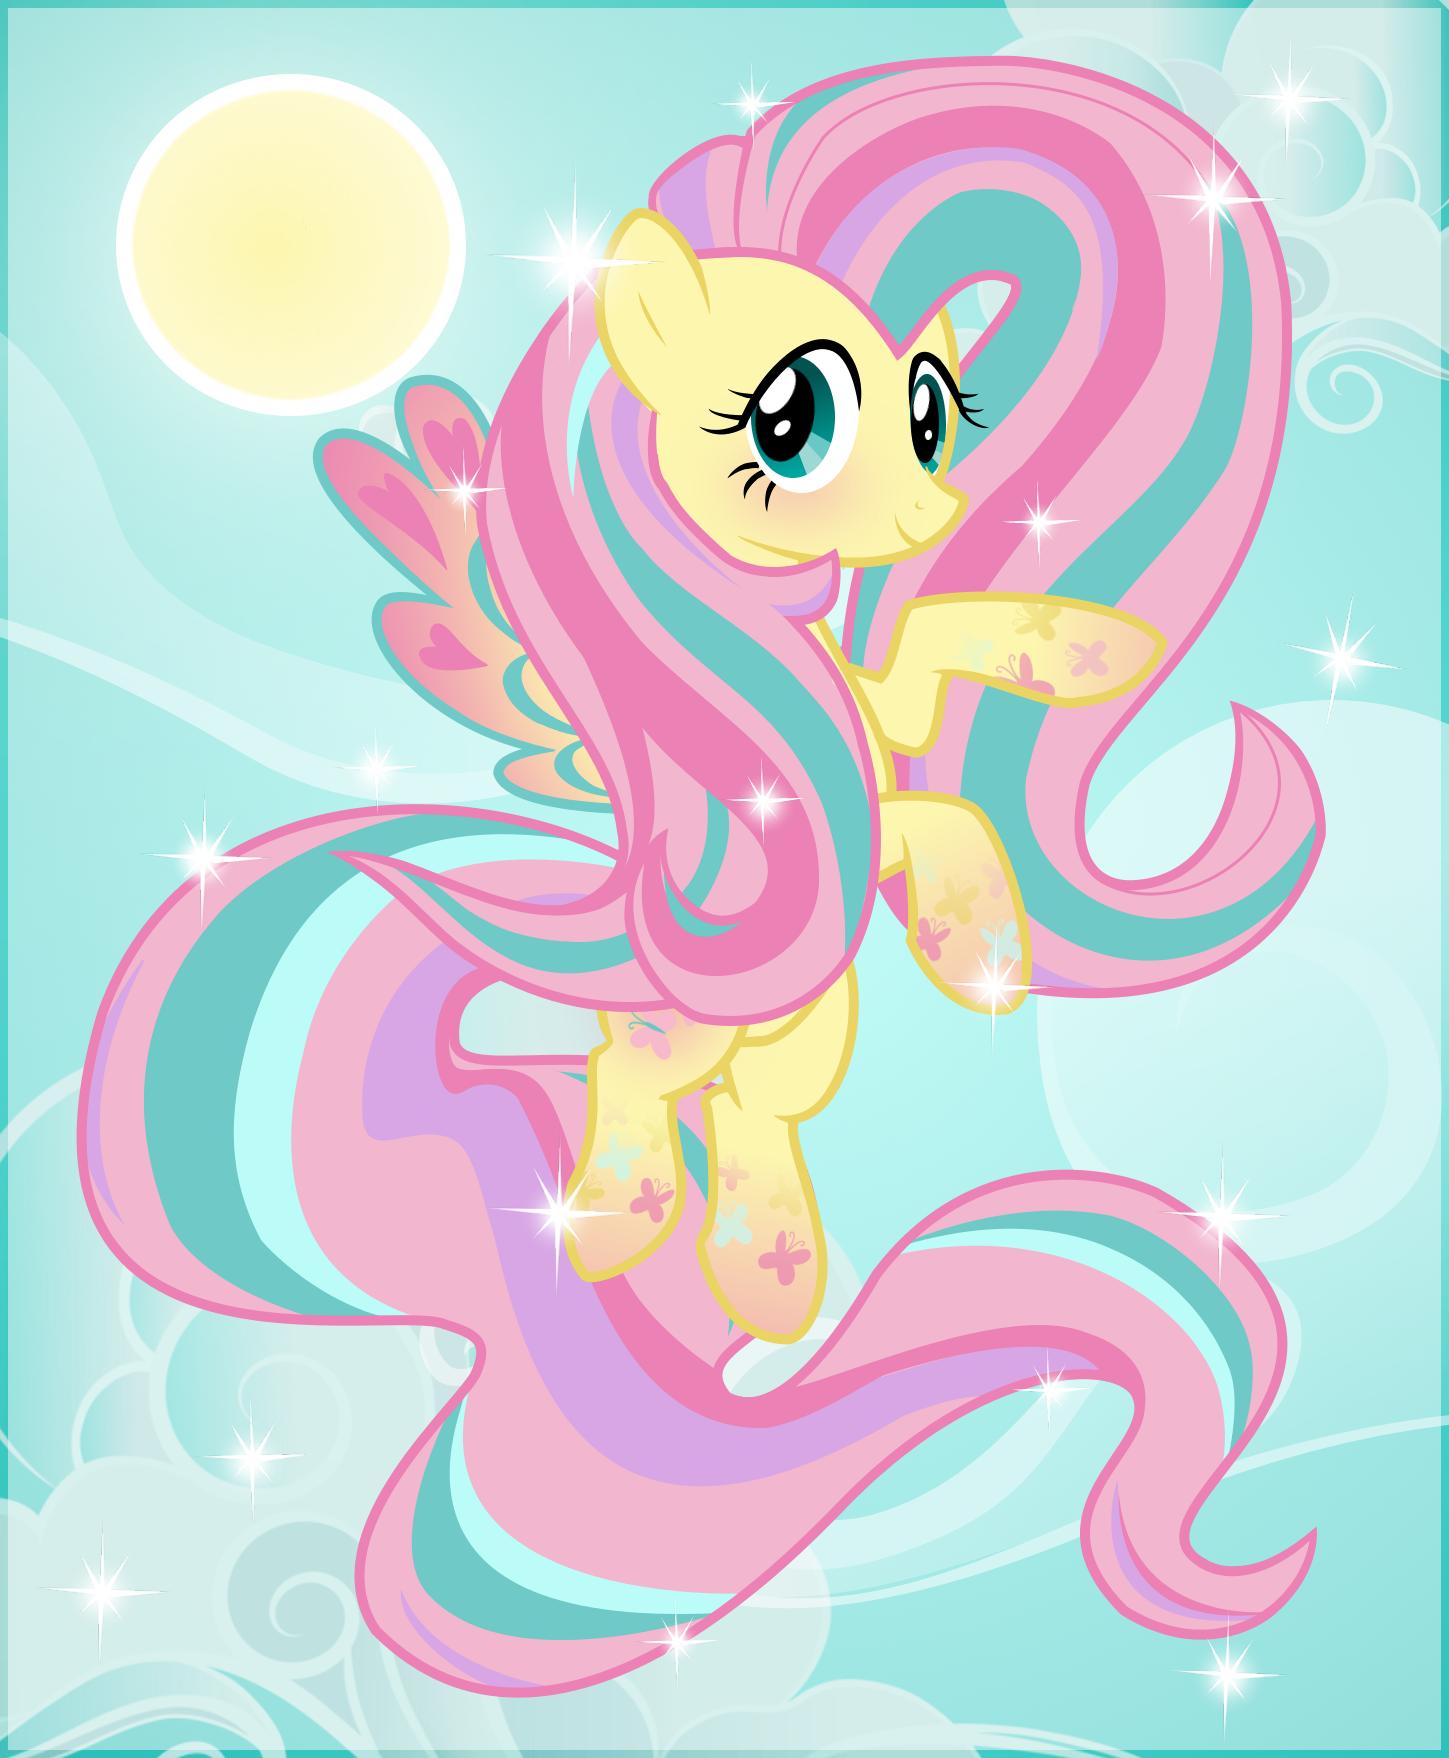 Rainbow Power Fluttershy by Idontknow350 on DeviantArt